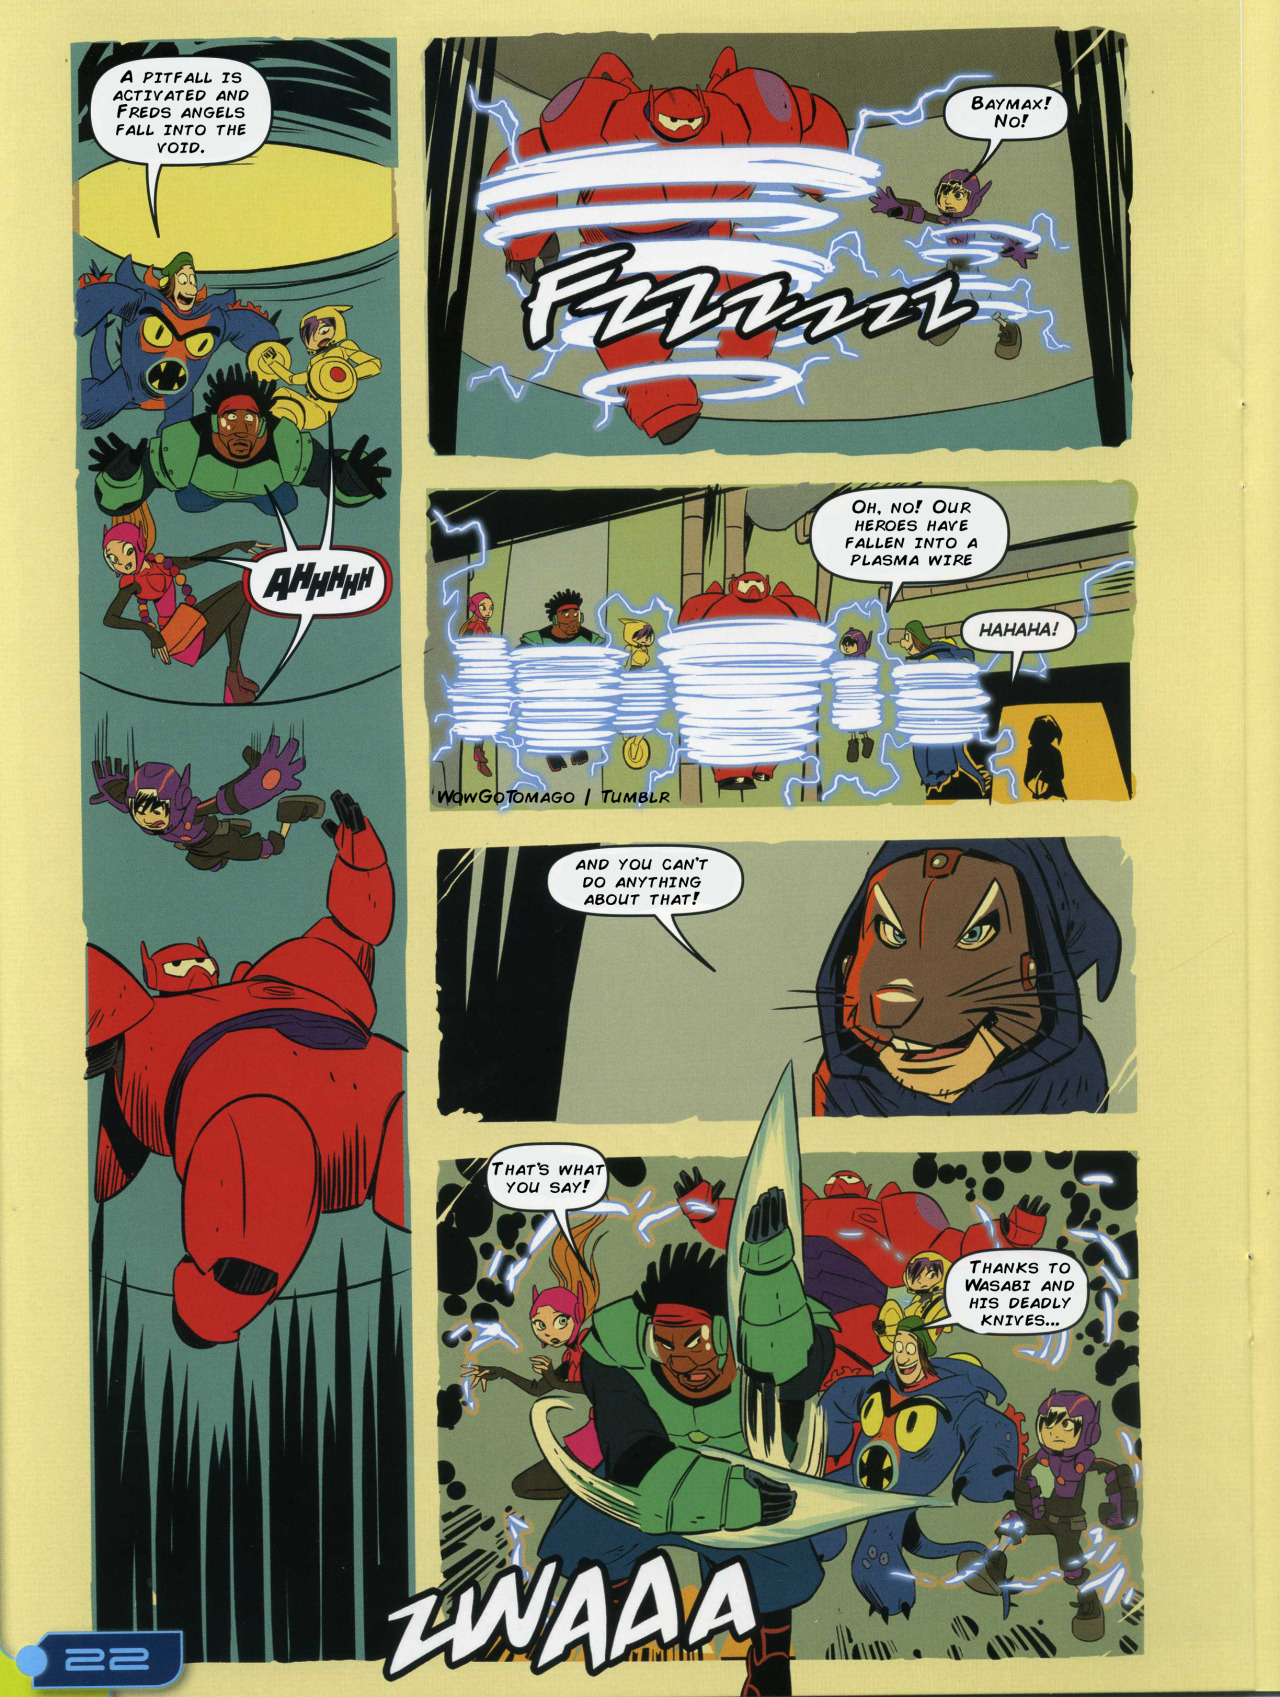 Big Hero Comic big hero 6 comic - adventurous imagination - big hero 6